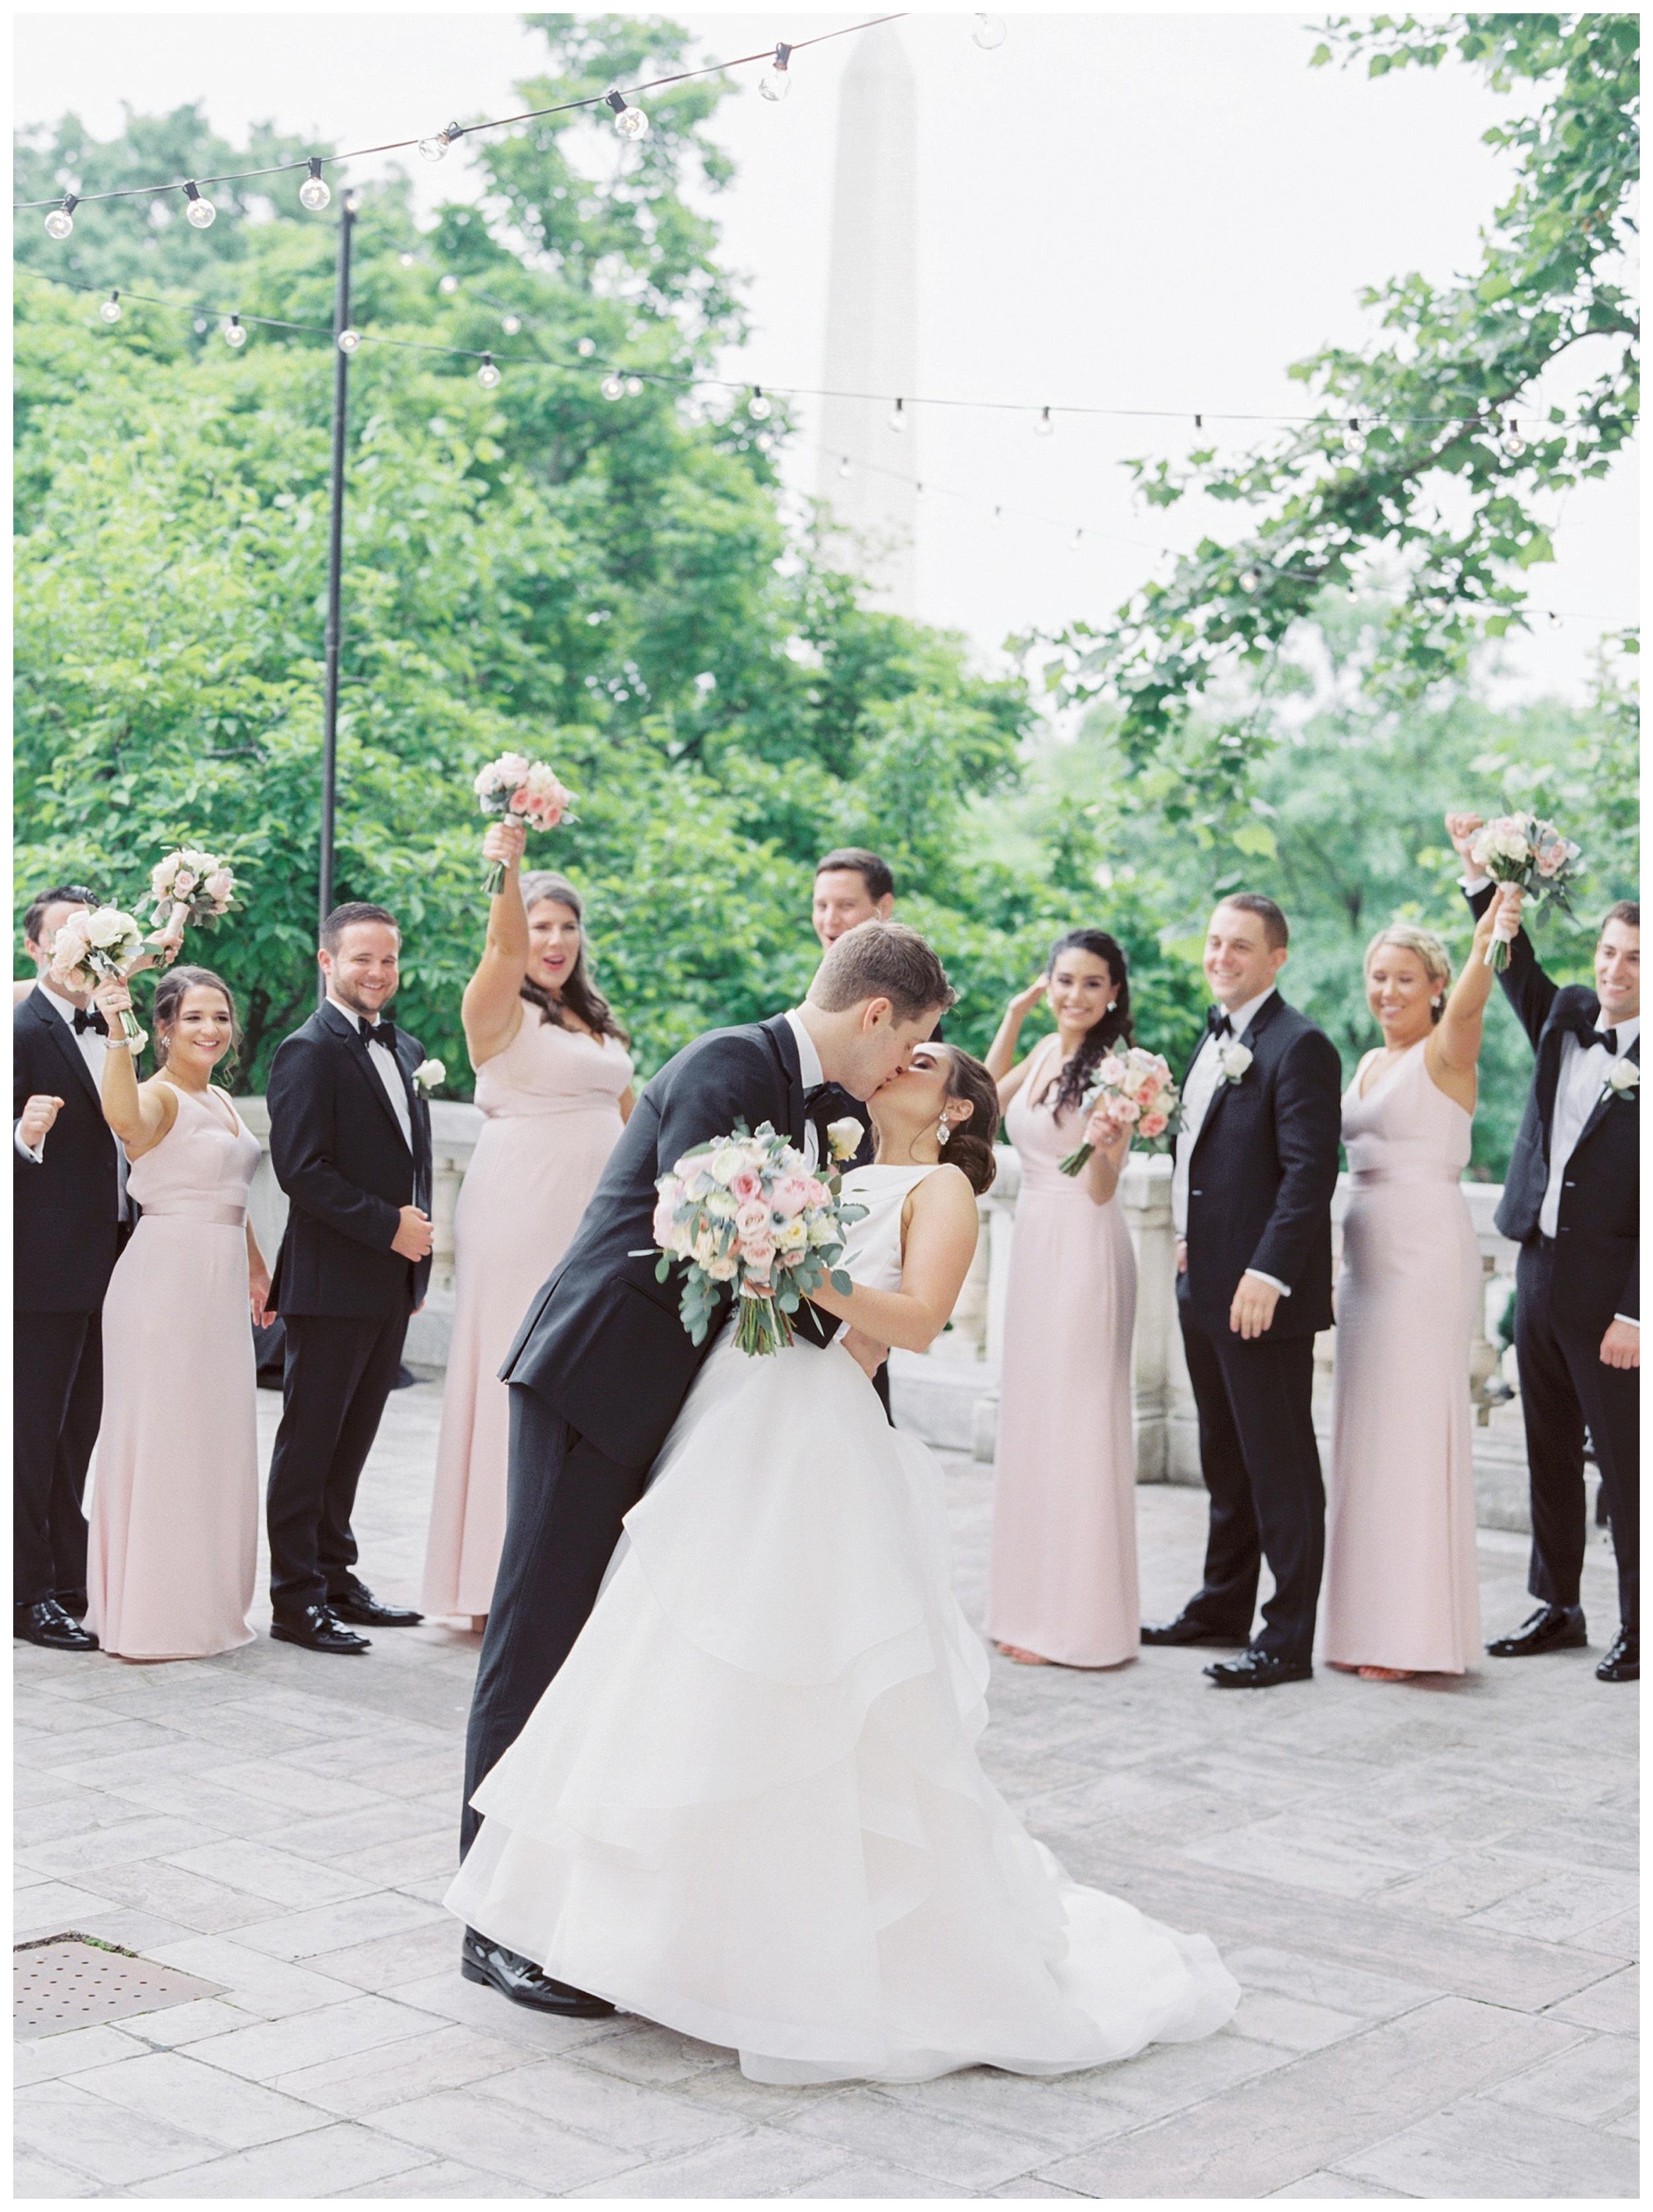 DAR Constitution Hall Wedding Wedding | Daughters of the American Revolution Wedding | District of Columbia Film Wedding Photographer Kir Tuben_0081.jpg